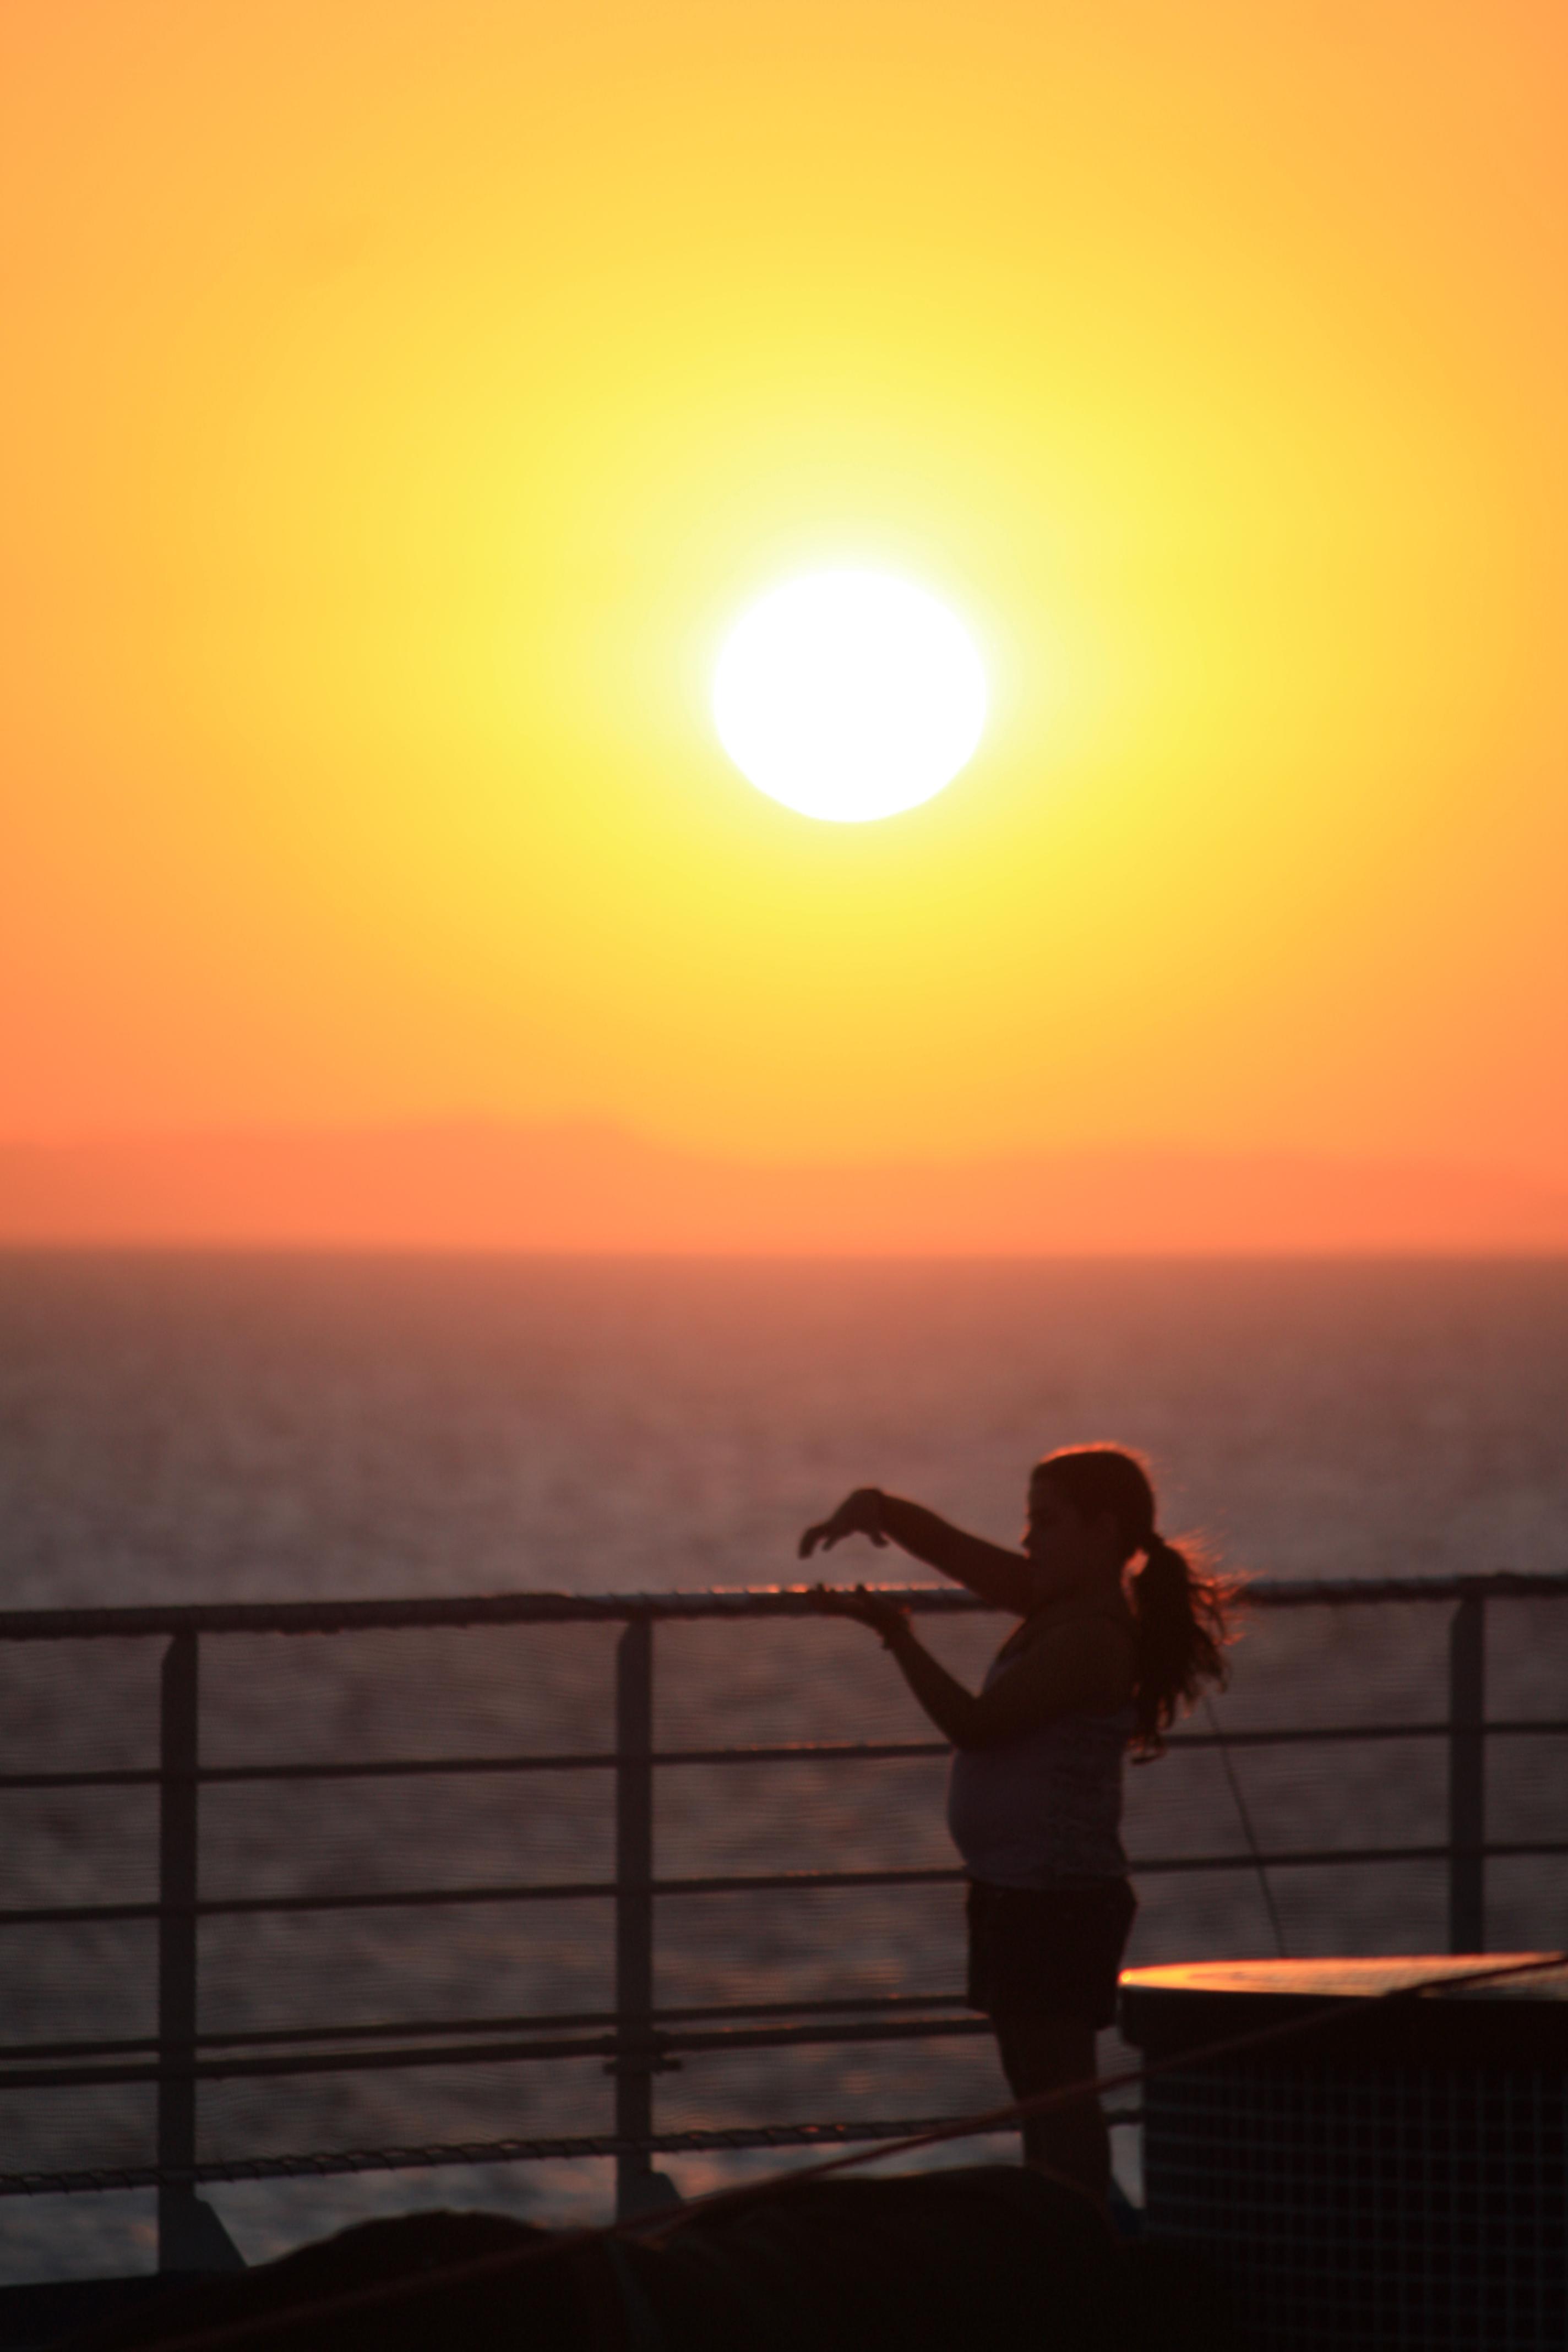 IMG_6913 Ηλιοβασίλεμα